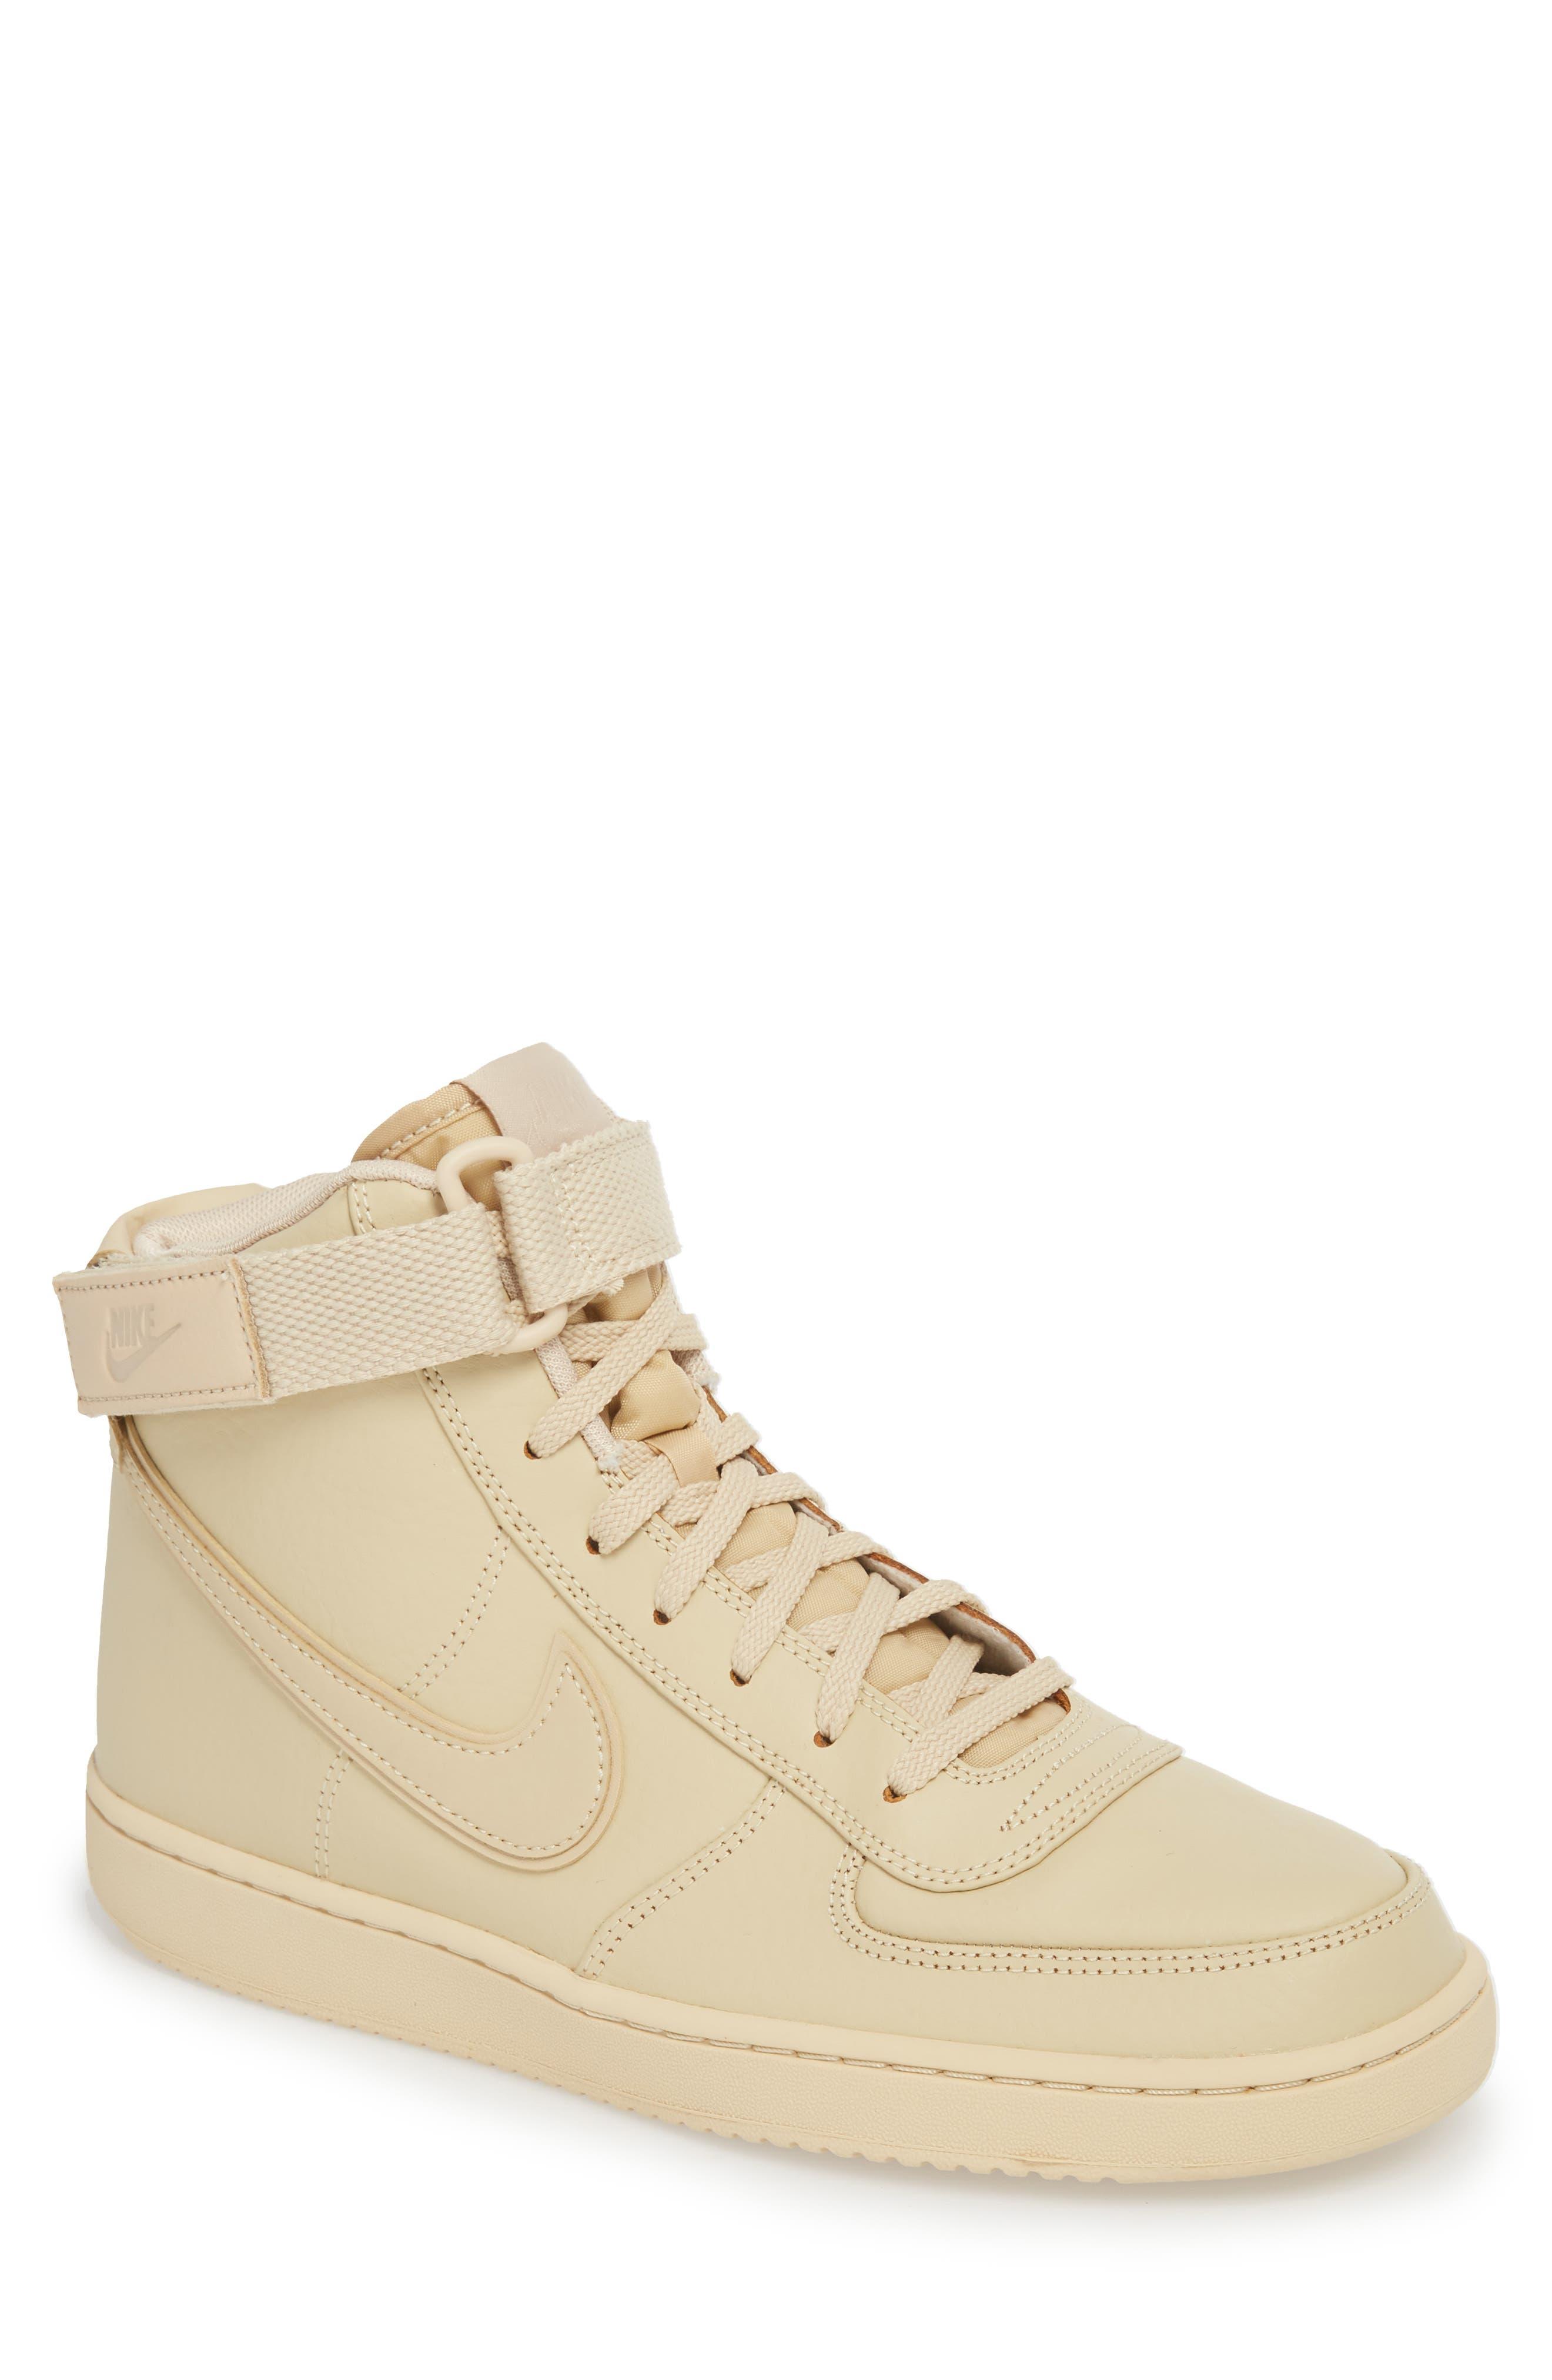 Vandal High Supreme Leather Sneaker,                             Main thumbnail 1, color,                             Desert Ore